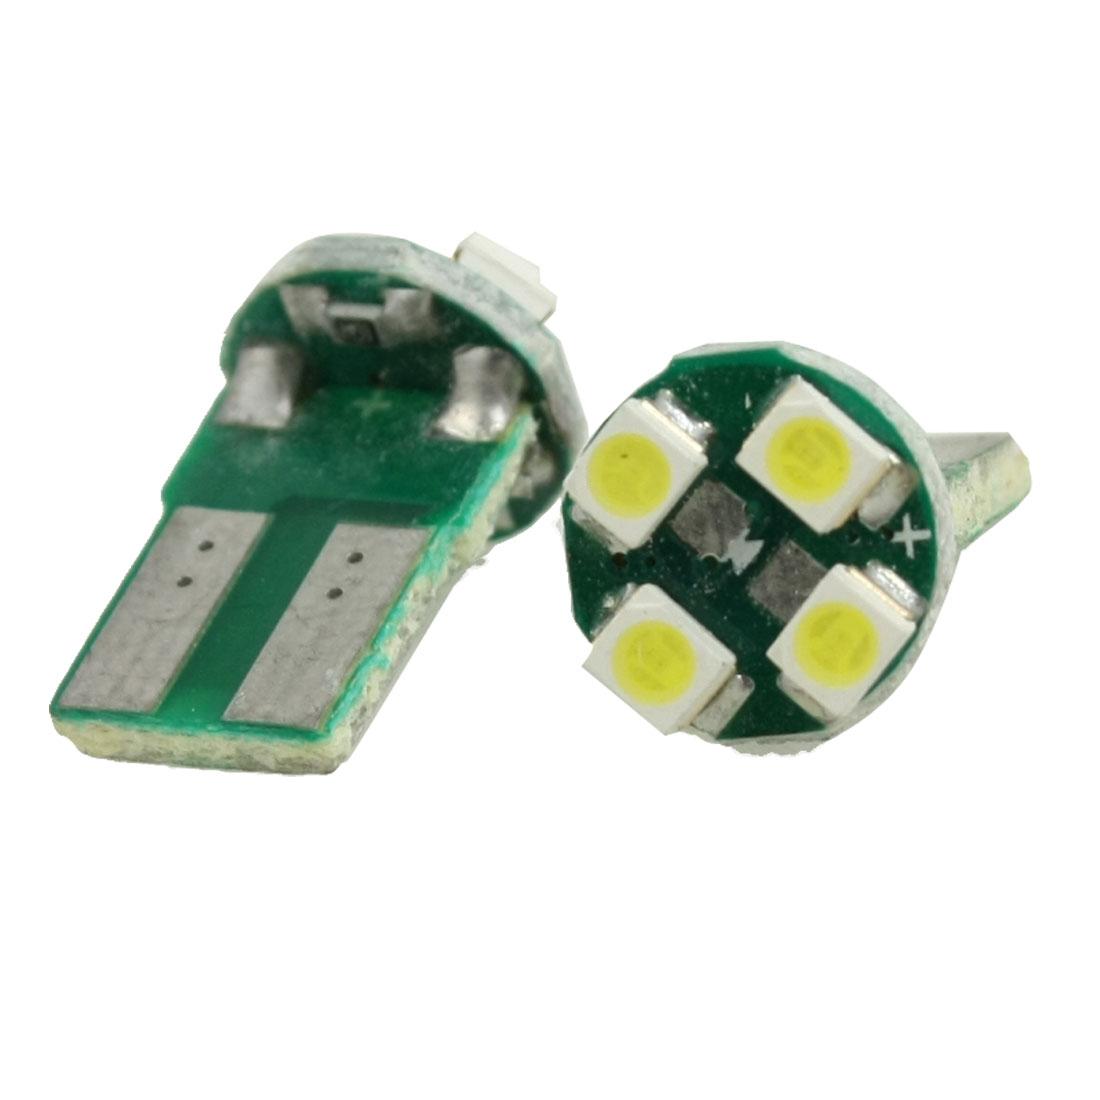 2 Pcs DC 12V 4 LED White Light T10 1210 SMD Bulb Lamp for Car Vehicle